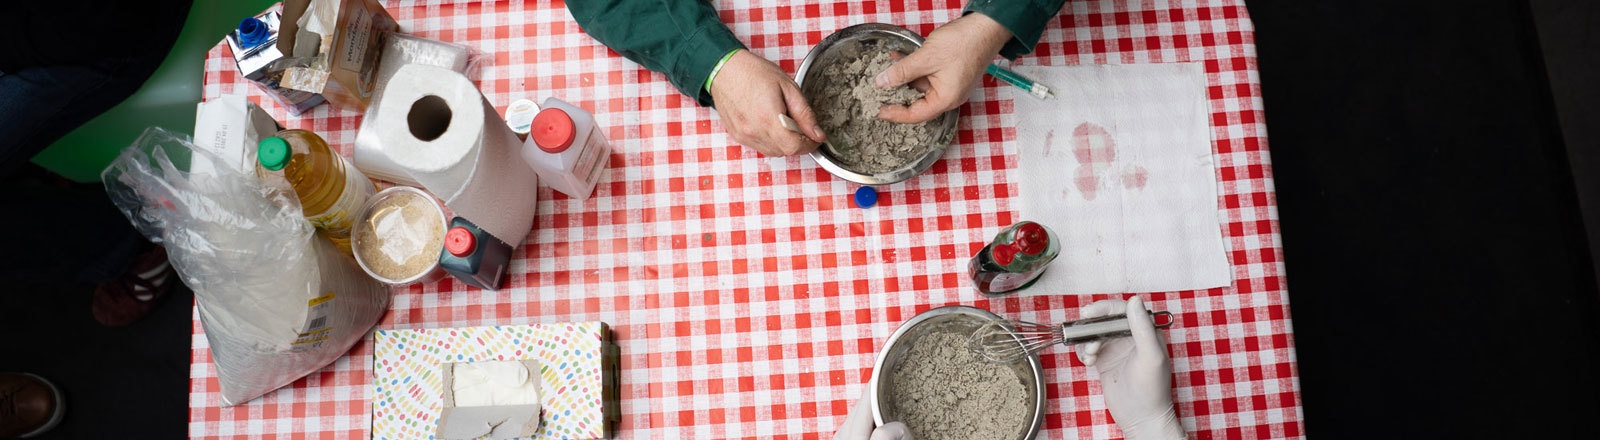 Netzbasteln kinetischer Sand Moritz Metz